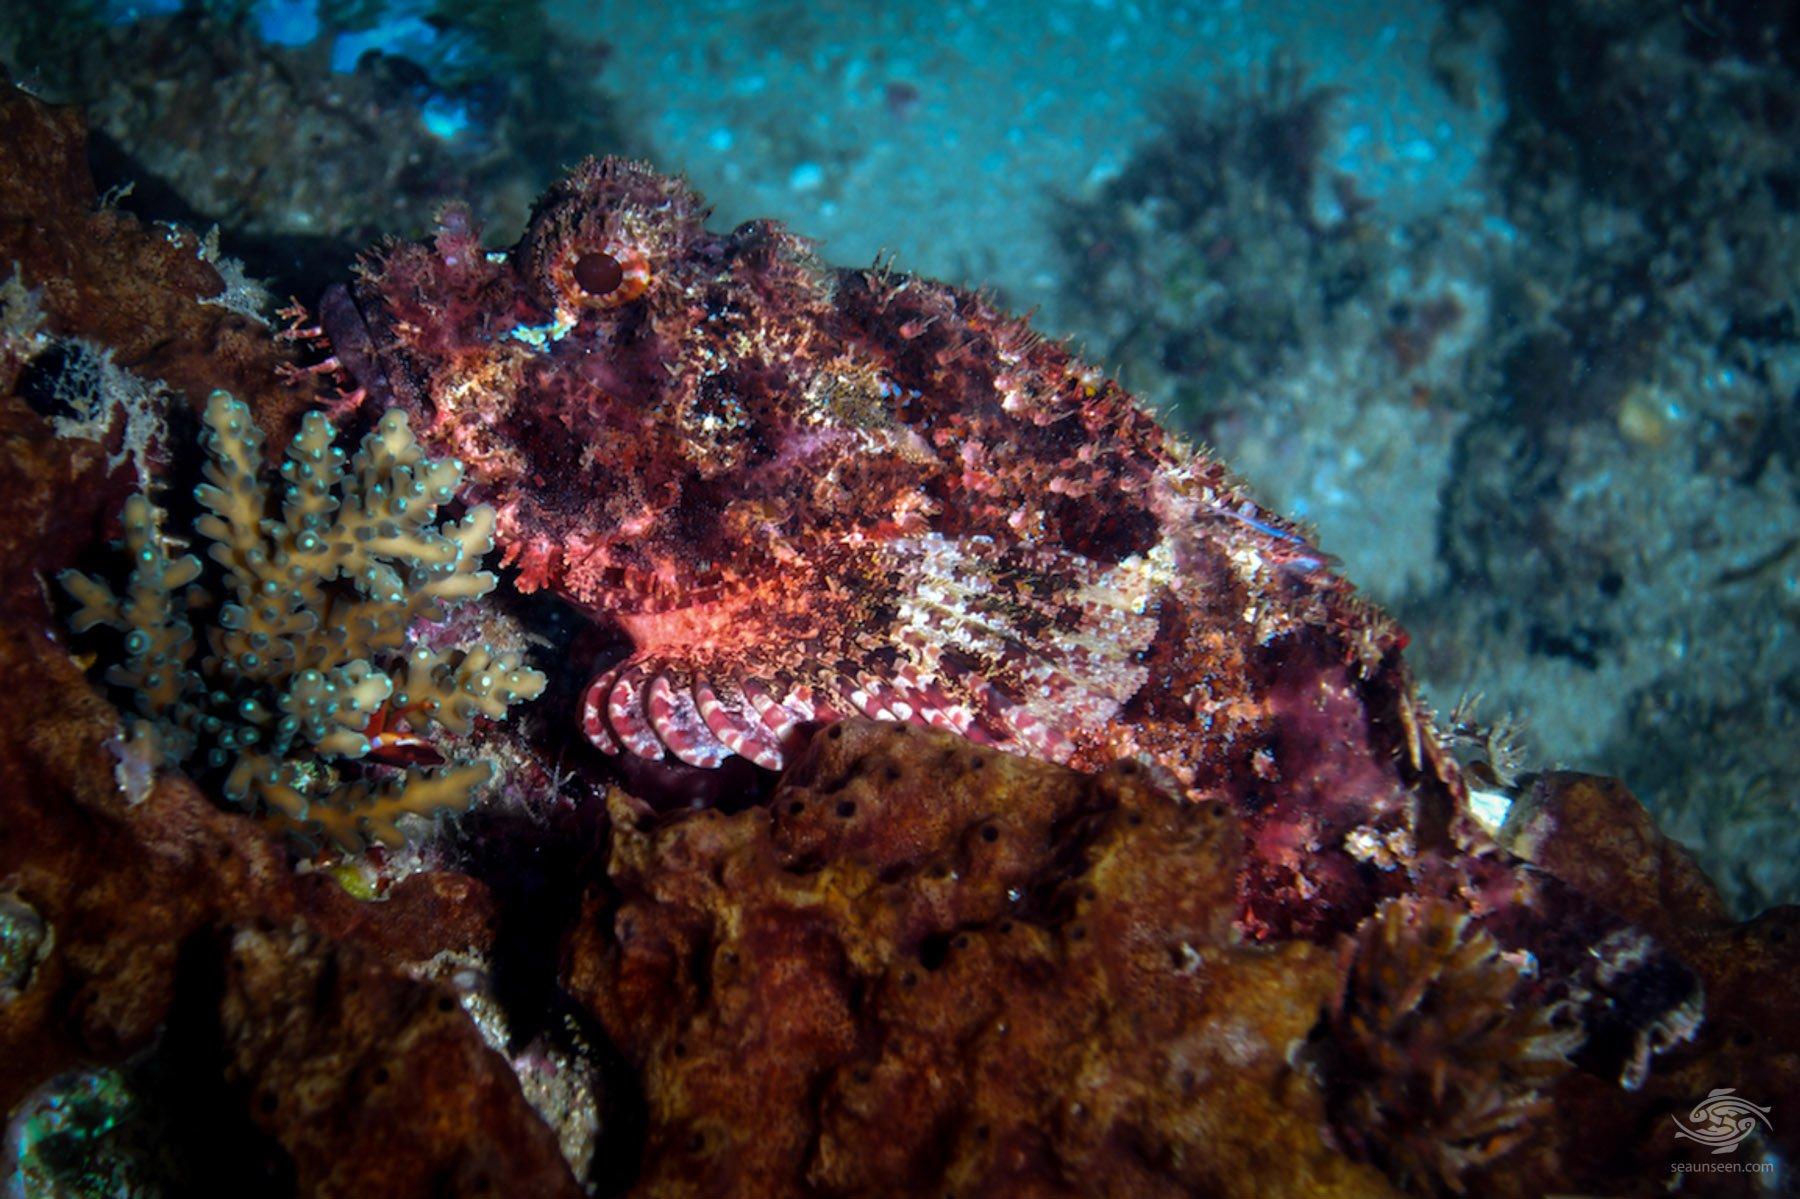 Tassled Scorpionfish 1